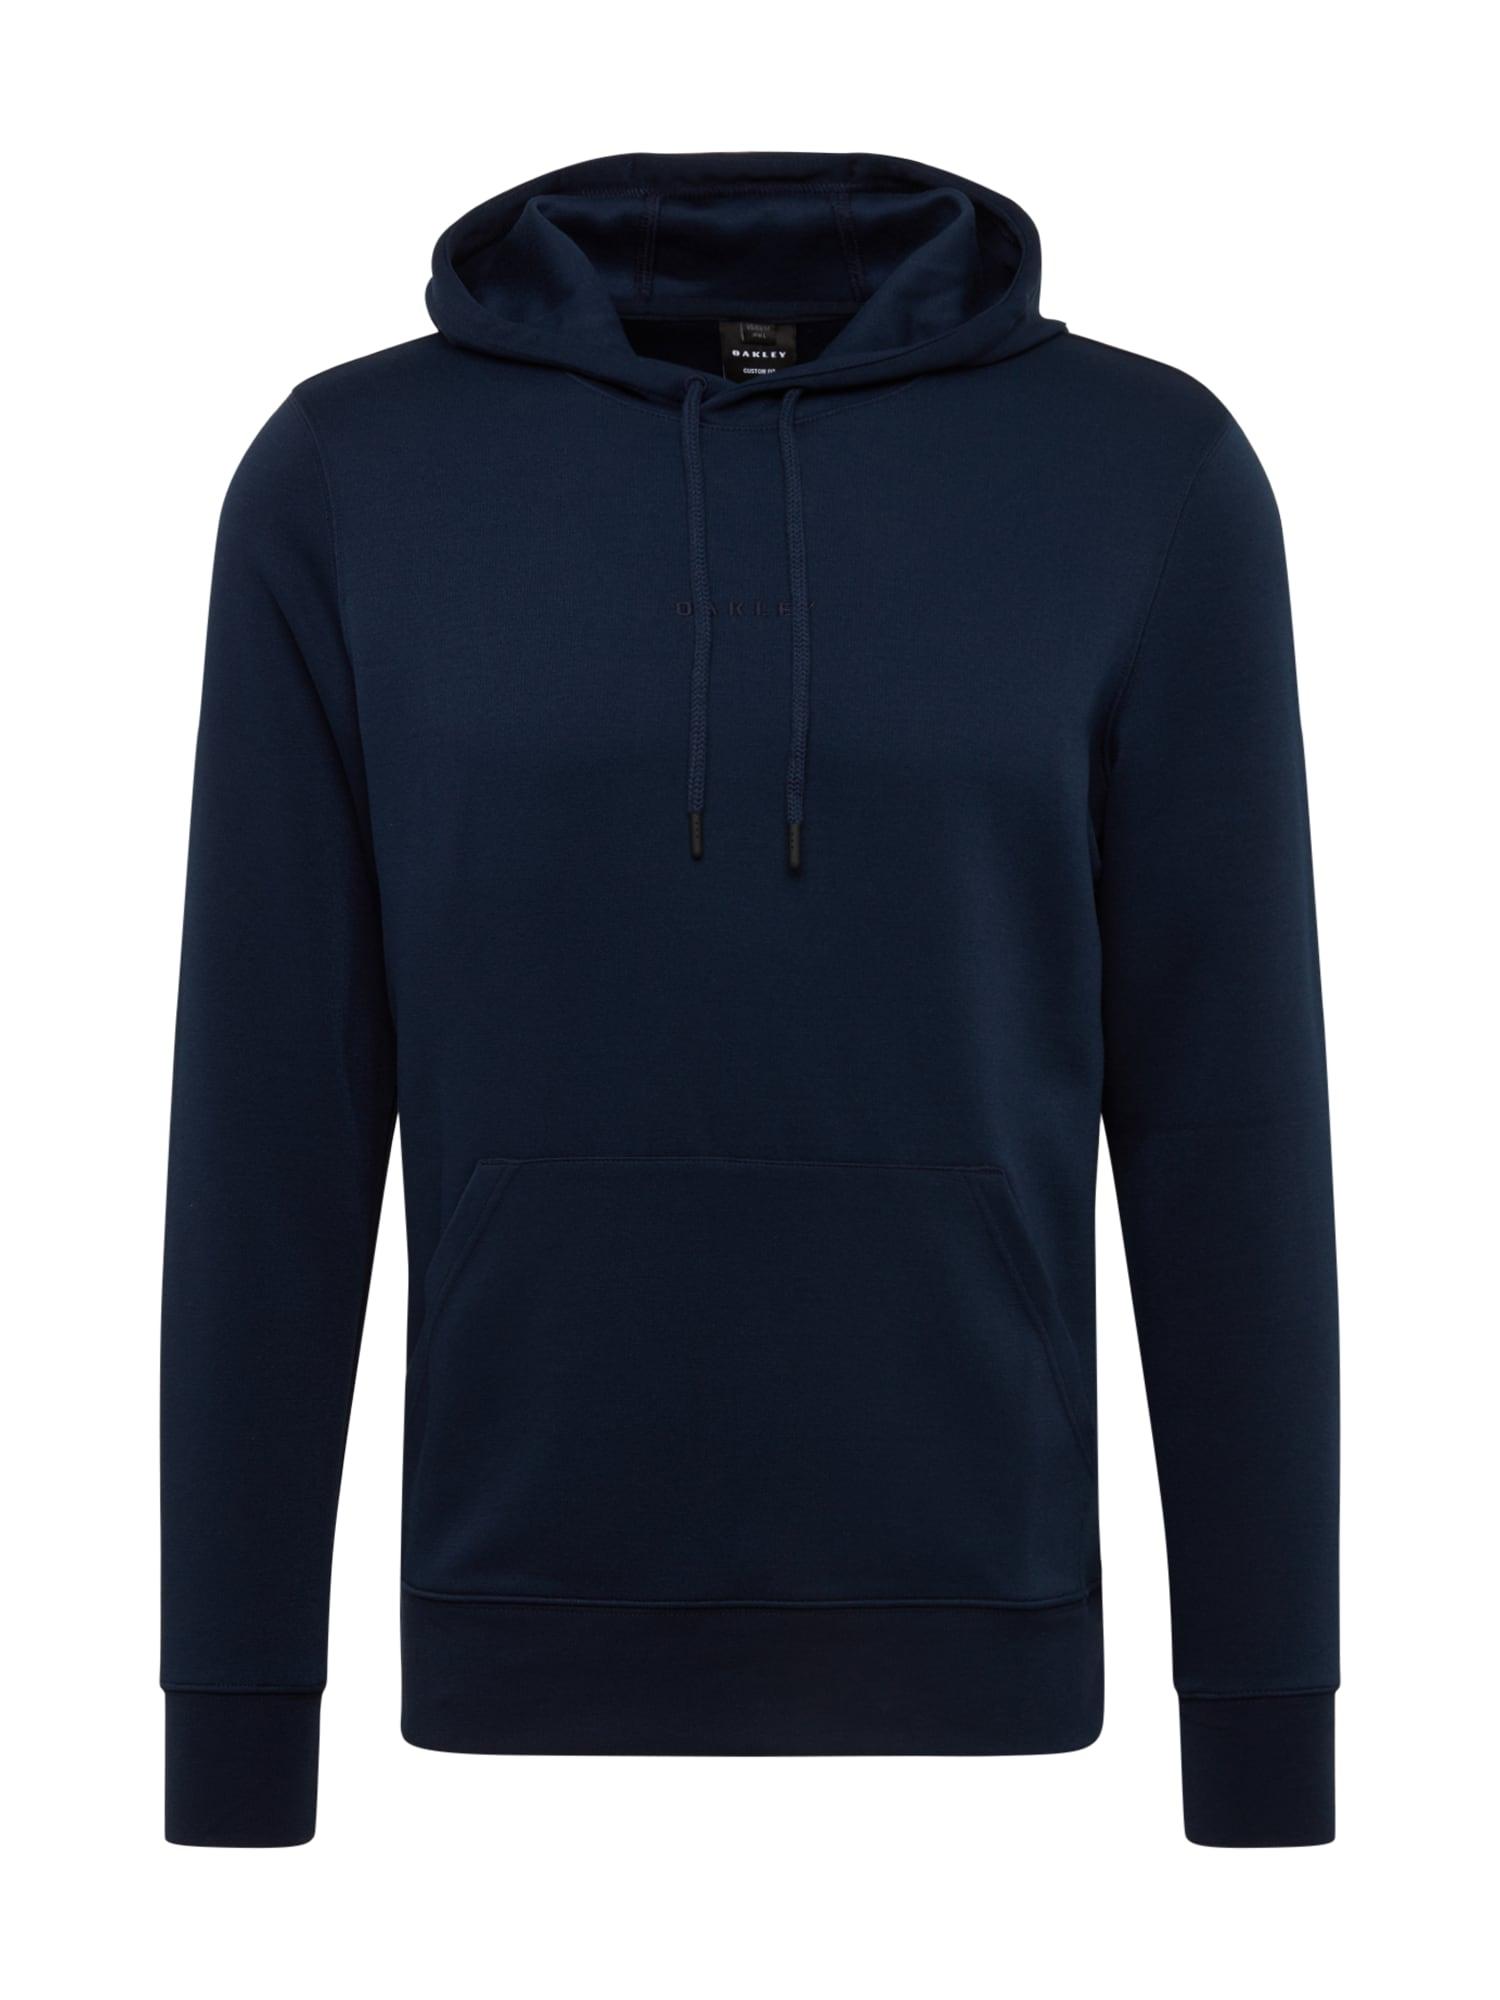 OAKLEY Sportinio tipo megztinis 'FULL FLEX PERFORMANCE' nakties mėlyna